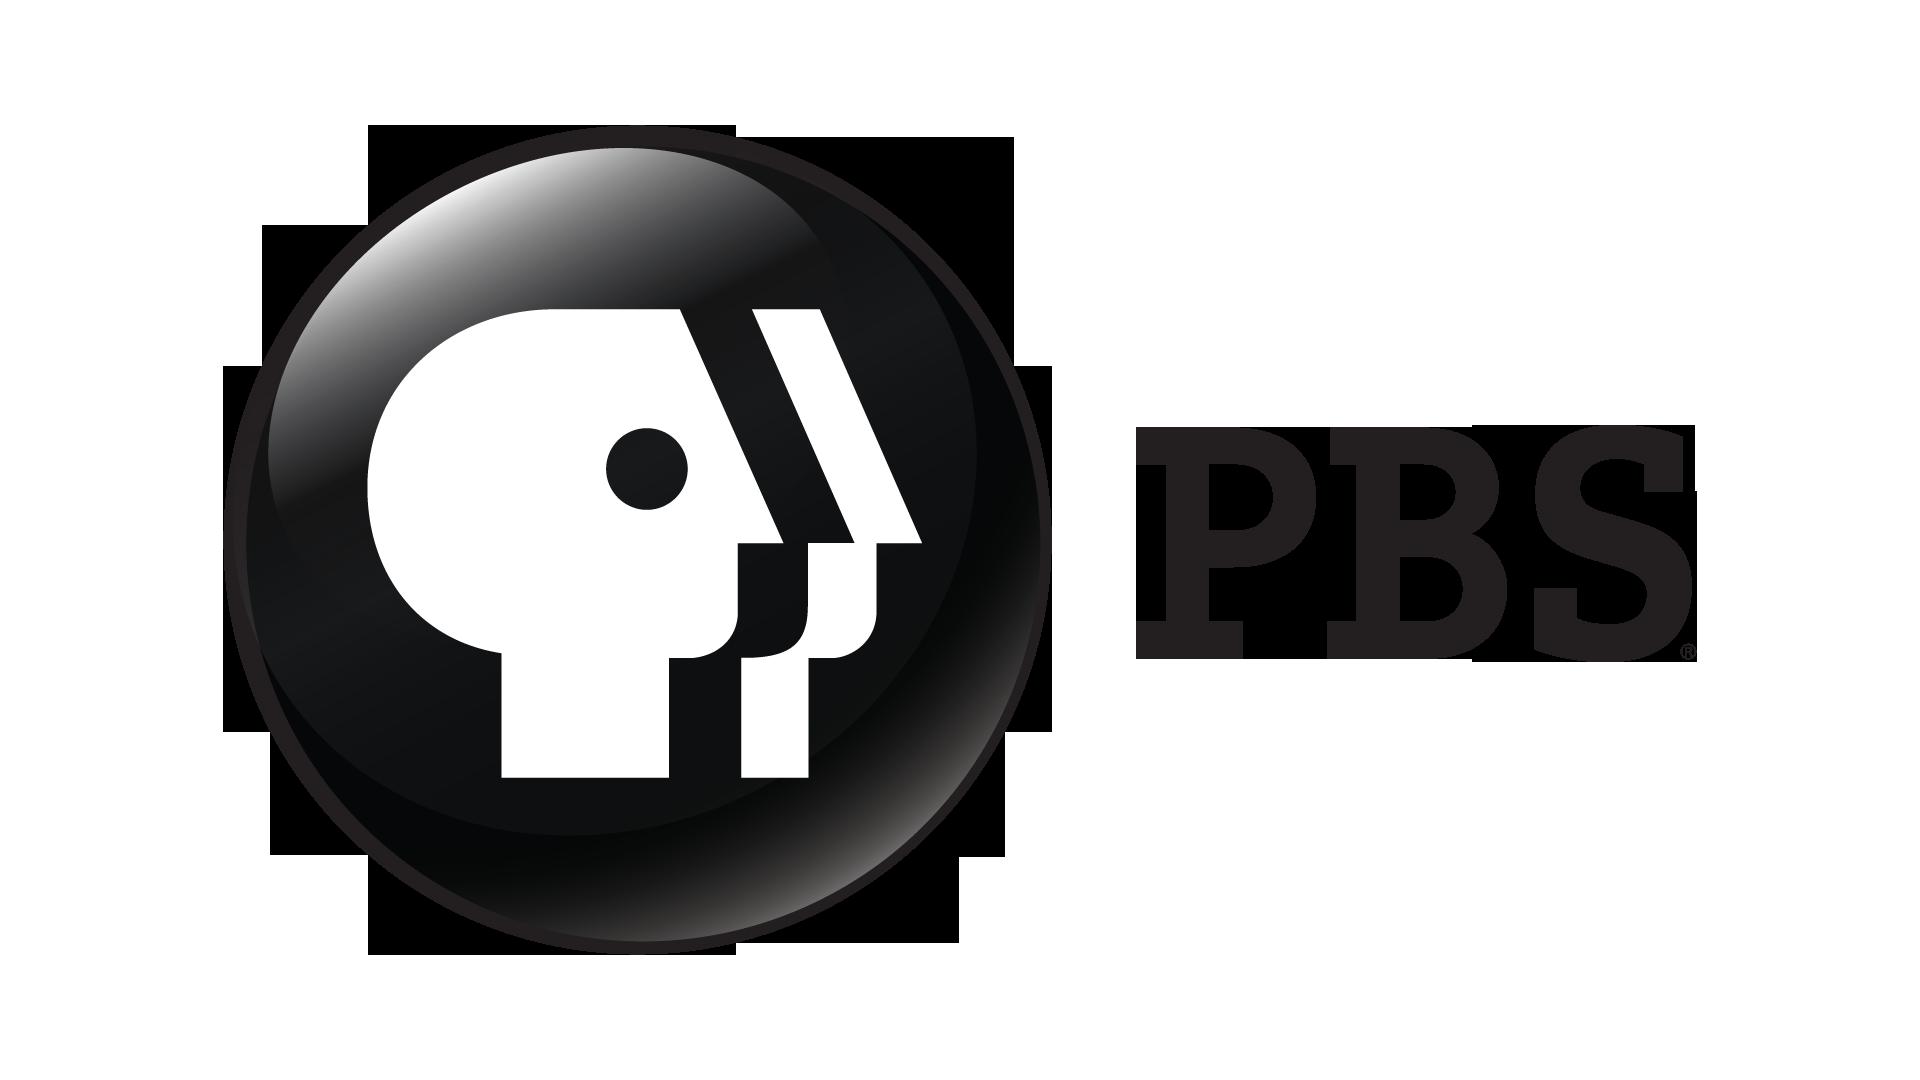 PBS (Public Broadcasting Service) logo